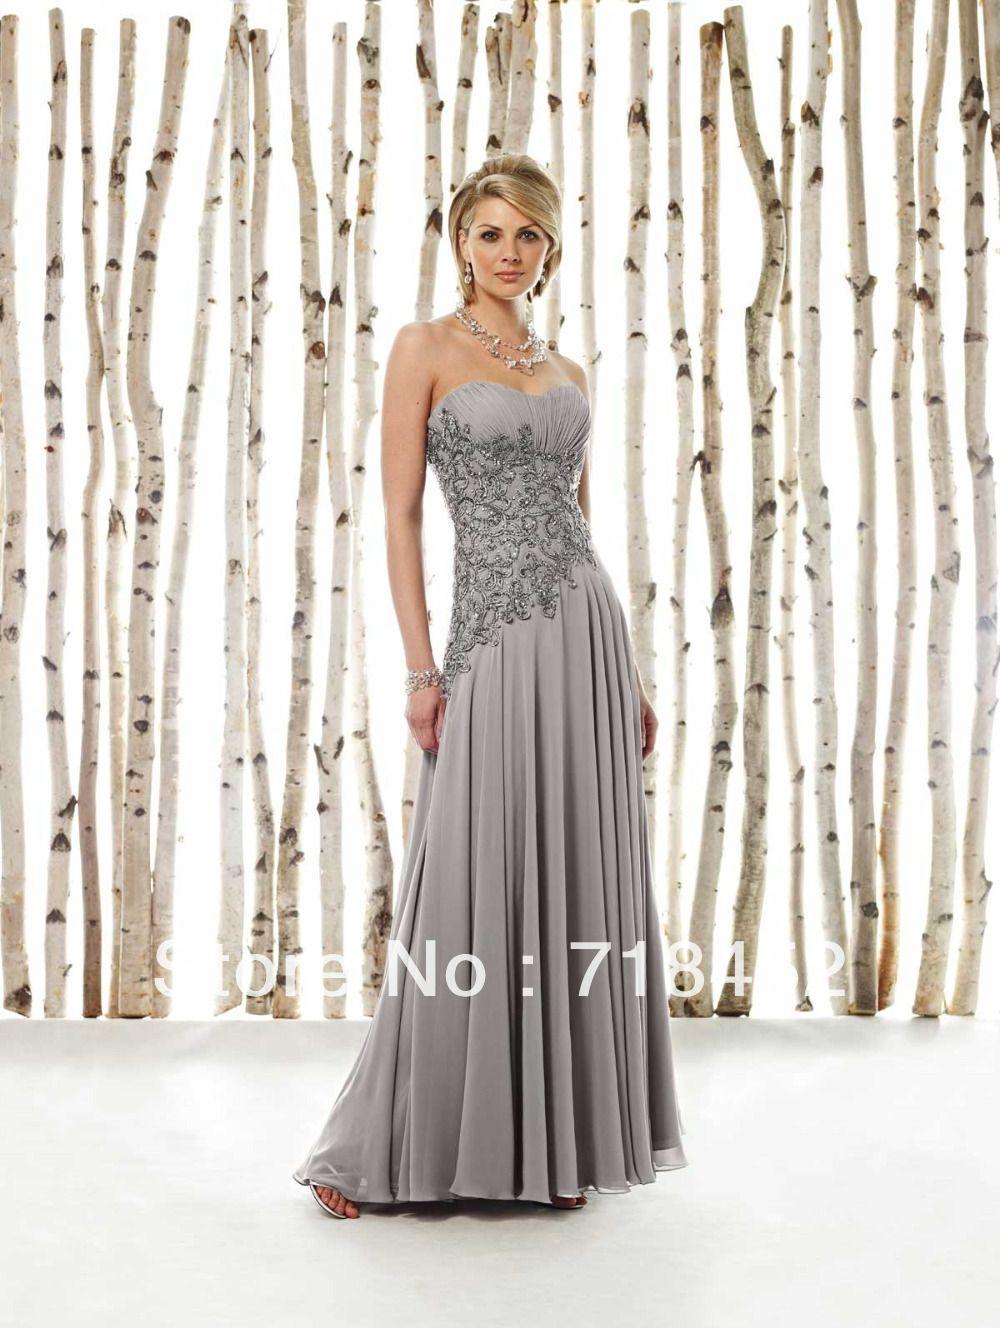 Madre de la novia on AliExpress.com from $132.65 | Ana | Pinterest ...